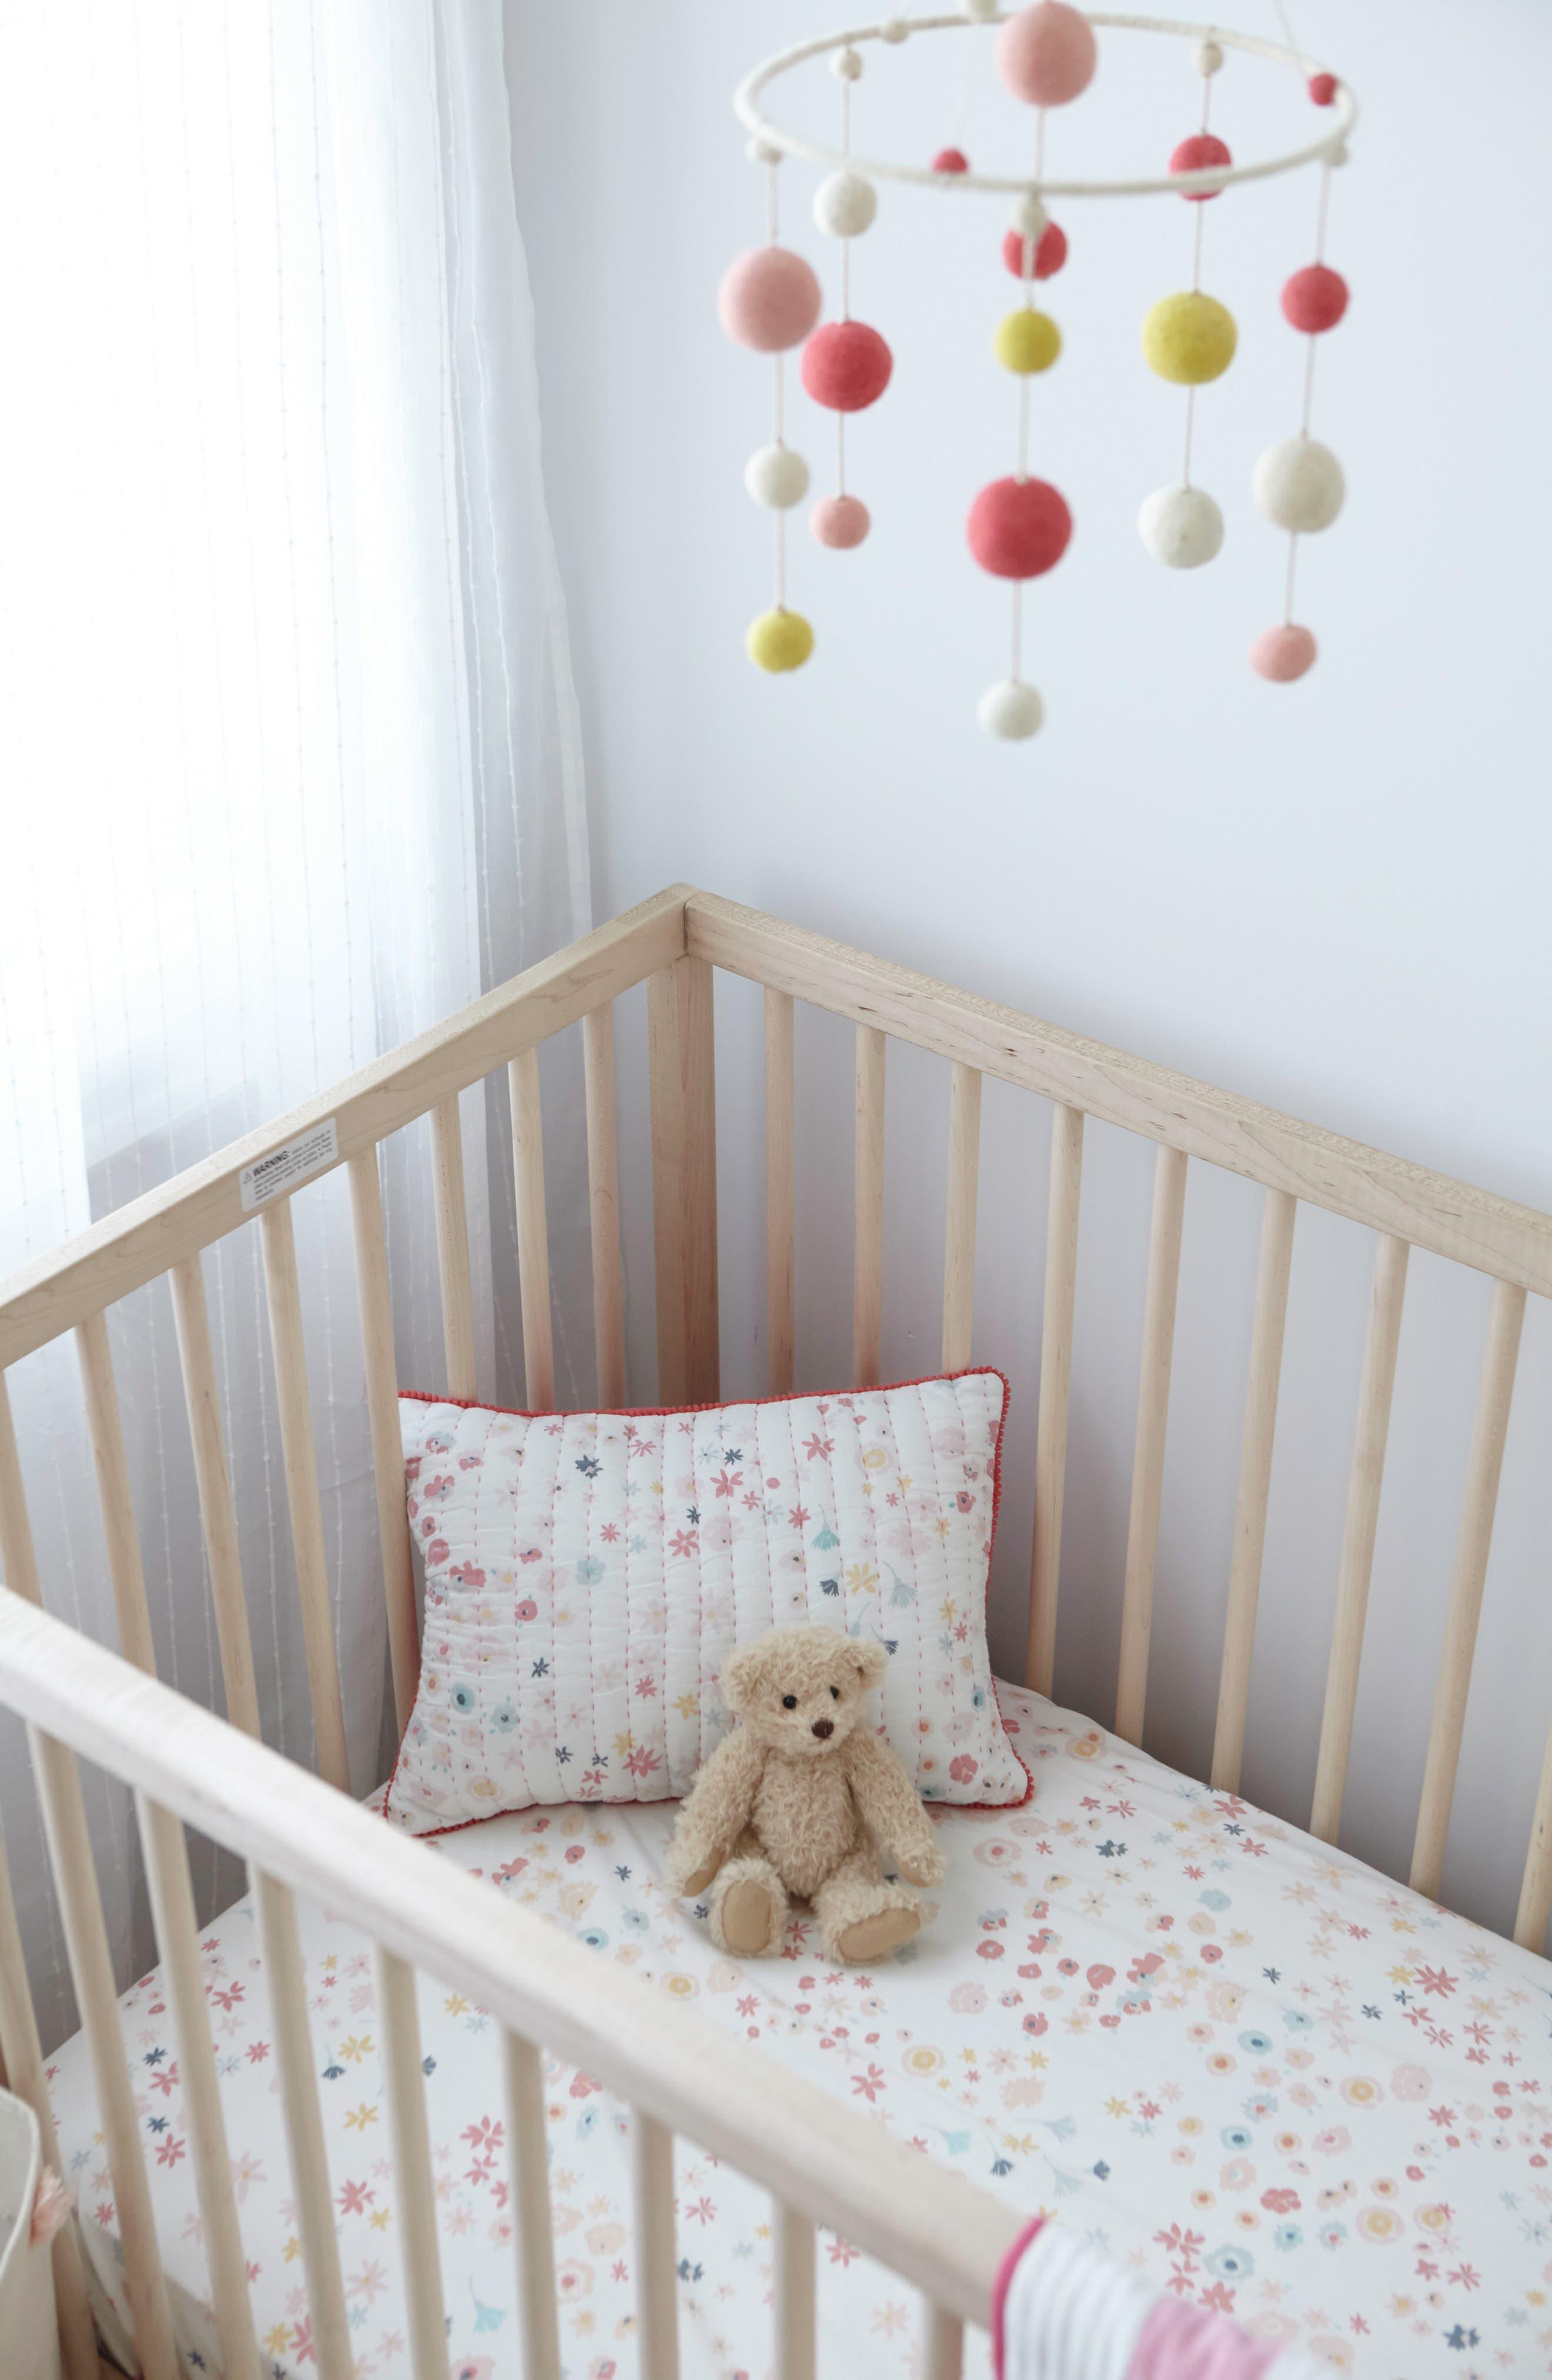 Showers Crib Sheet, Swaddle, Blanket & Pillow Set,                             Alternate thumbnail 3, color,                             PINK